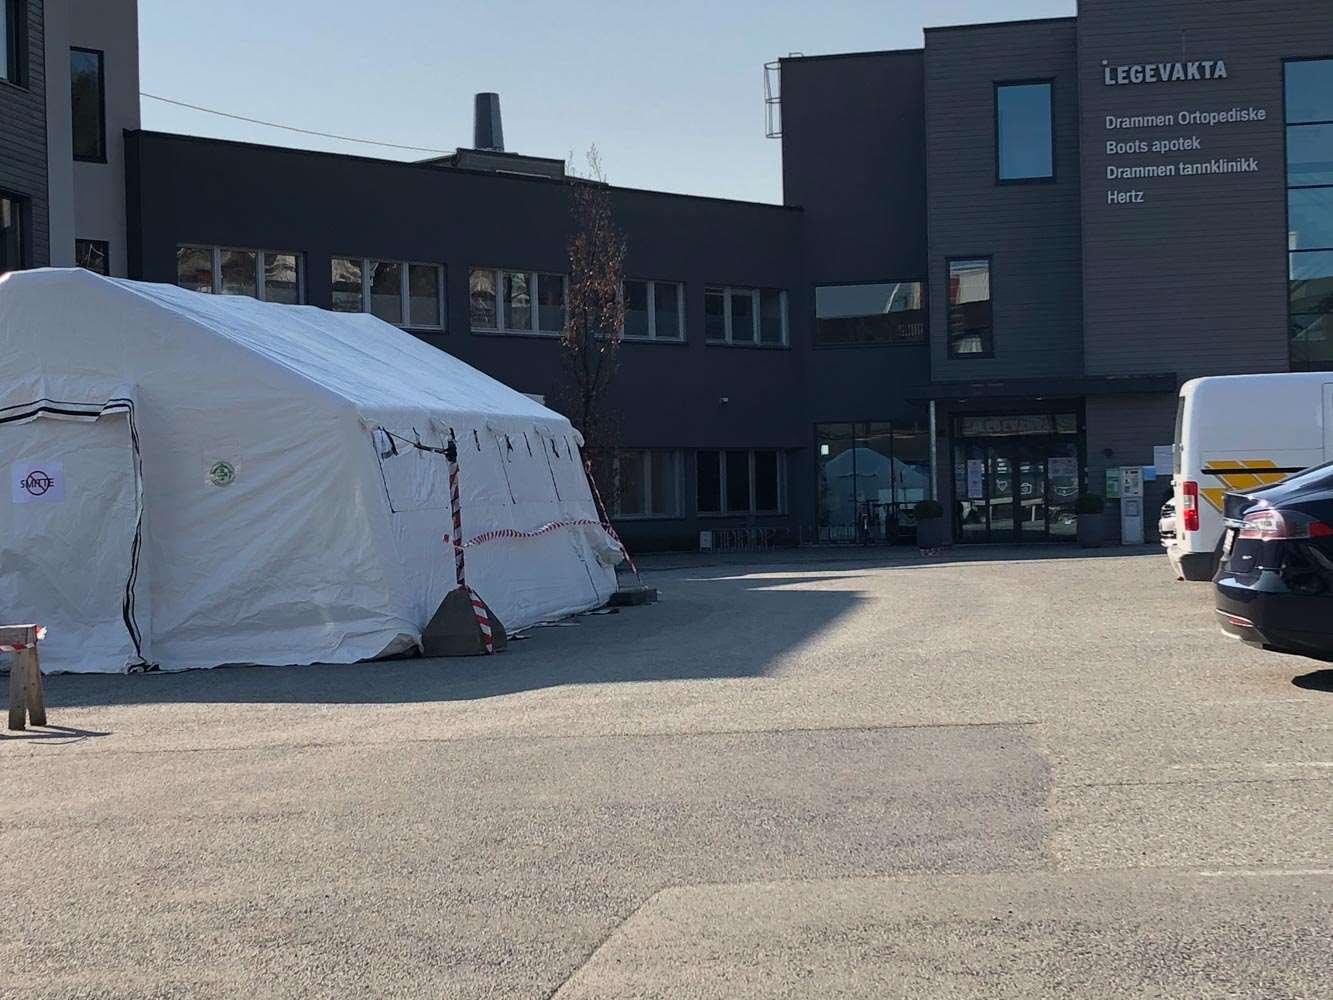 Telt Pa Legevakten Drammen Kommune